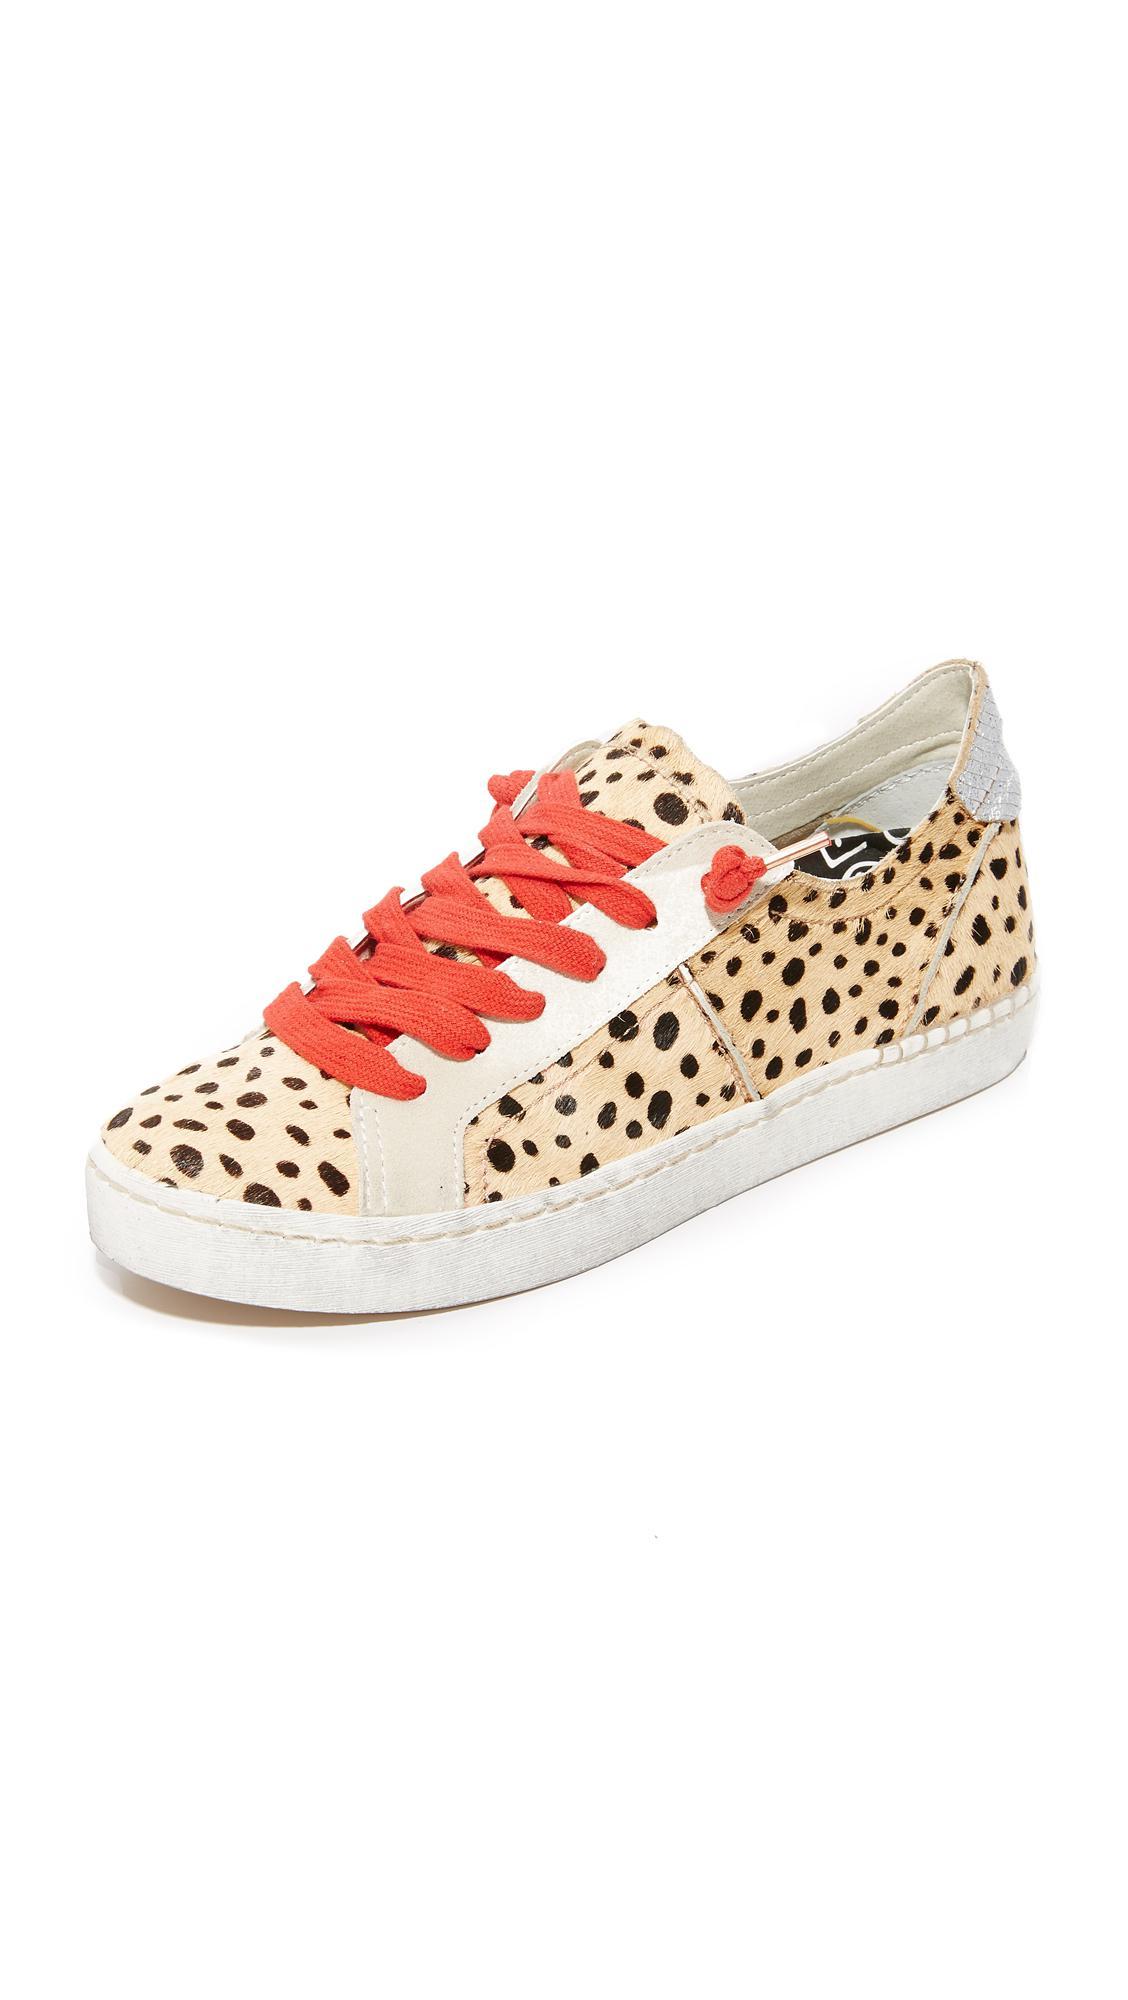 59d204d9df0b Dolce Vita Zalen Haircalf Sneakers - Lyst